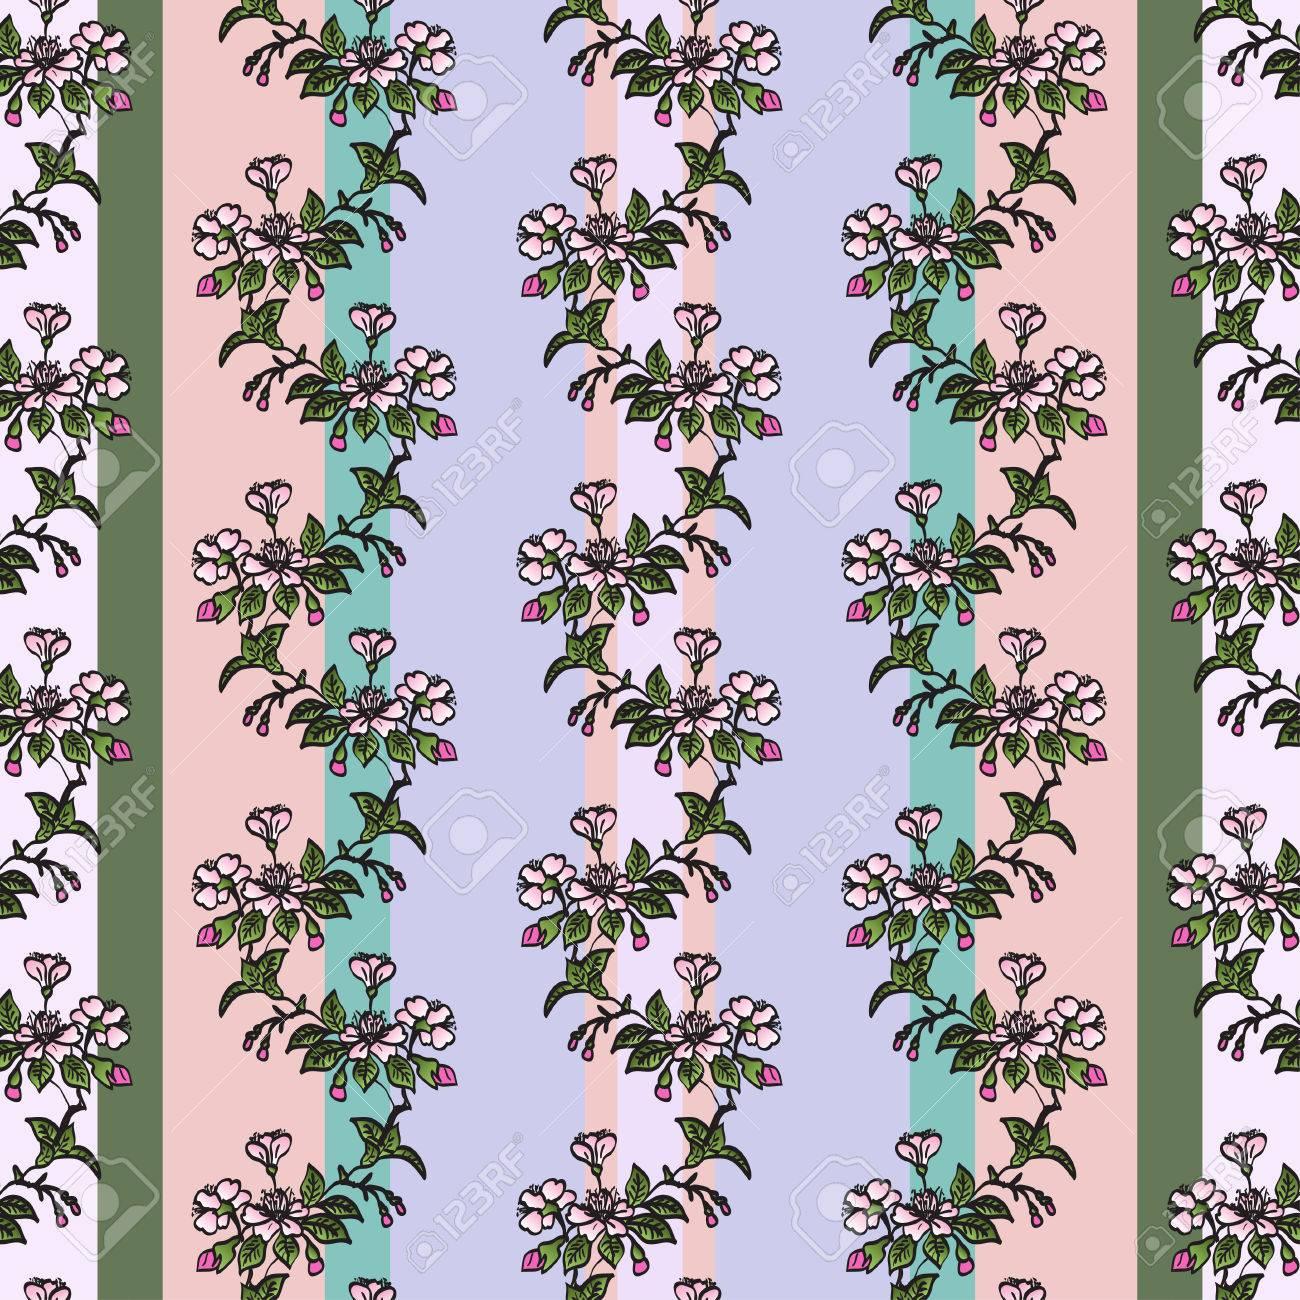 Seamless Vertical Vintage Pattern With Hand Drawn Twig Of Sakura